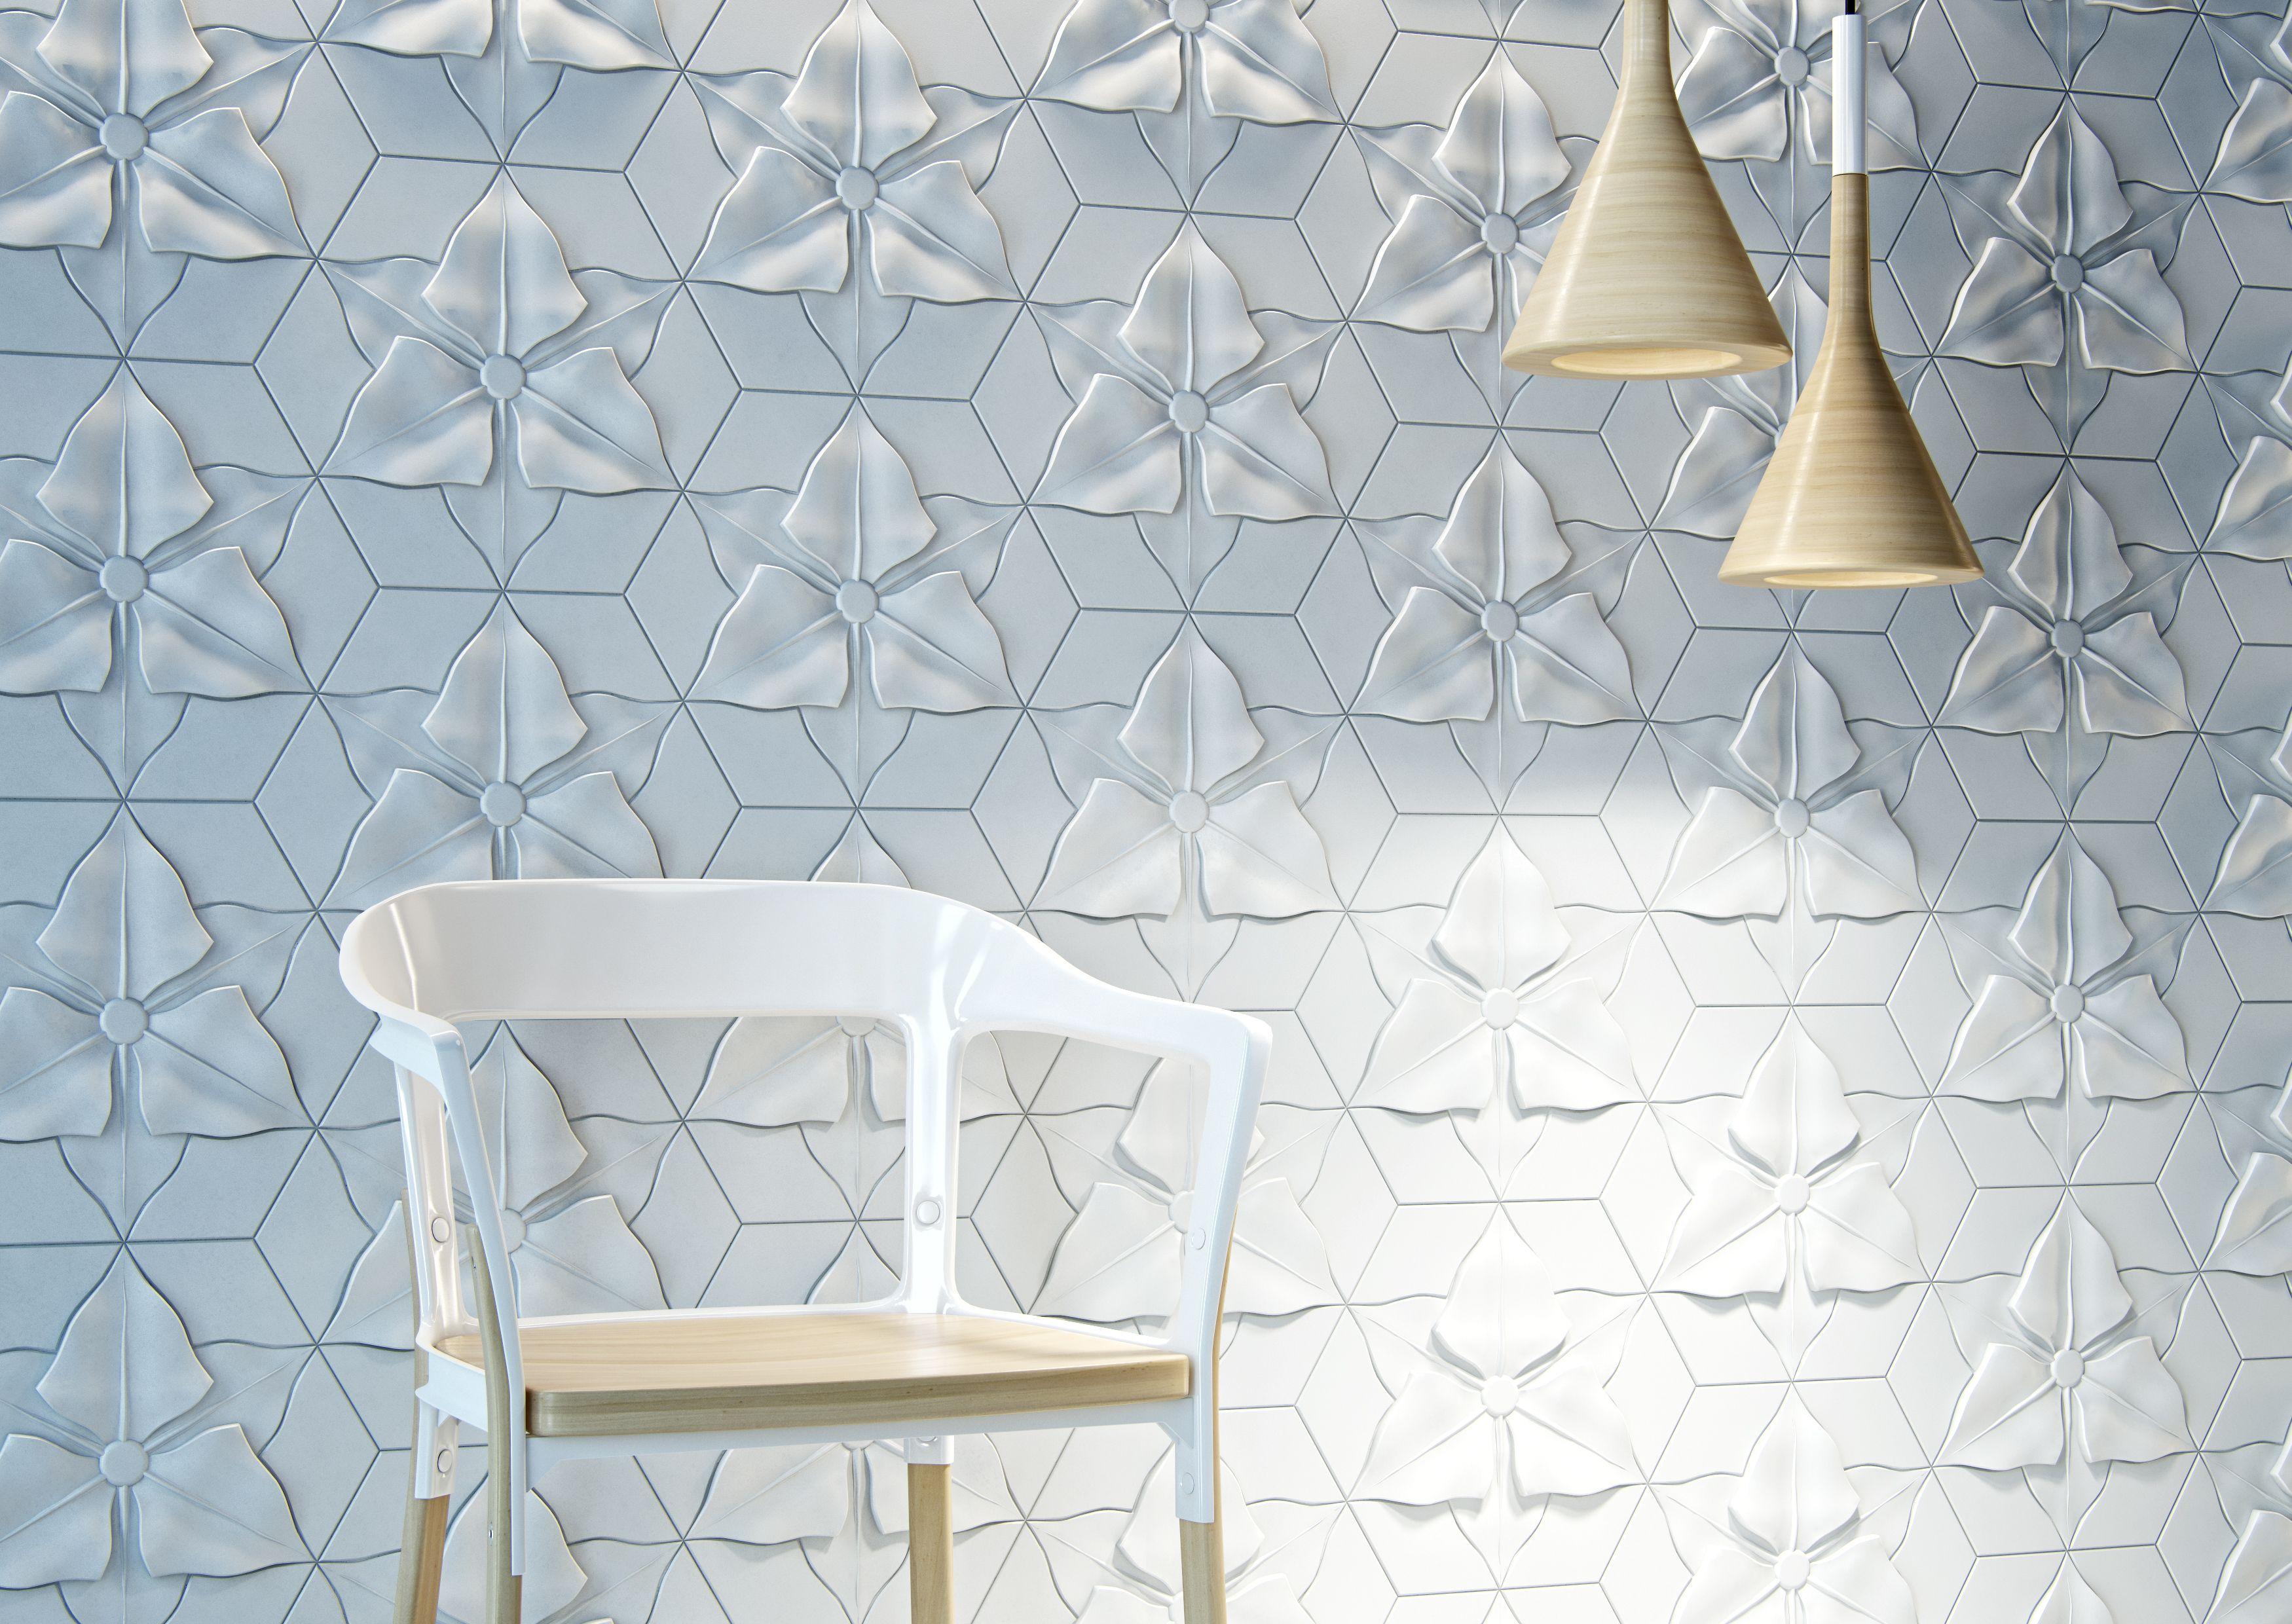 Interior with Florentin tiles | Florentin | Pinterest | Interiors ...